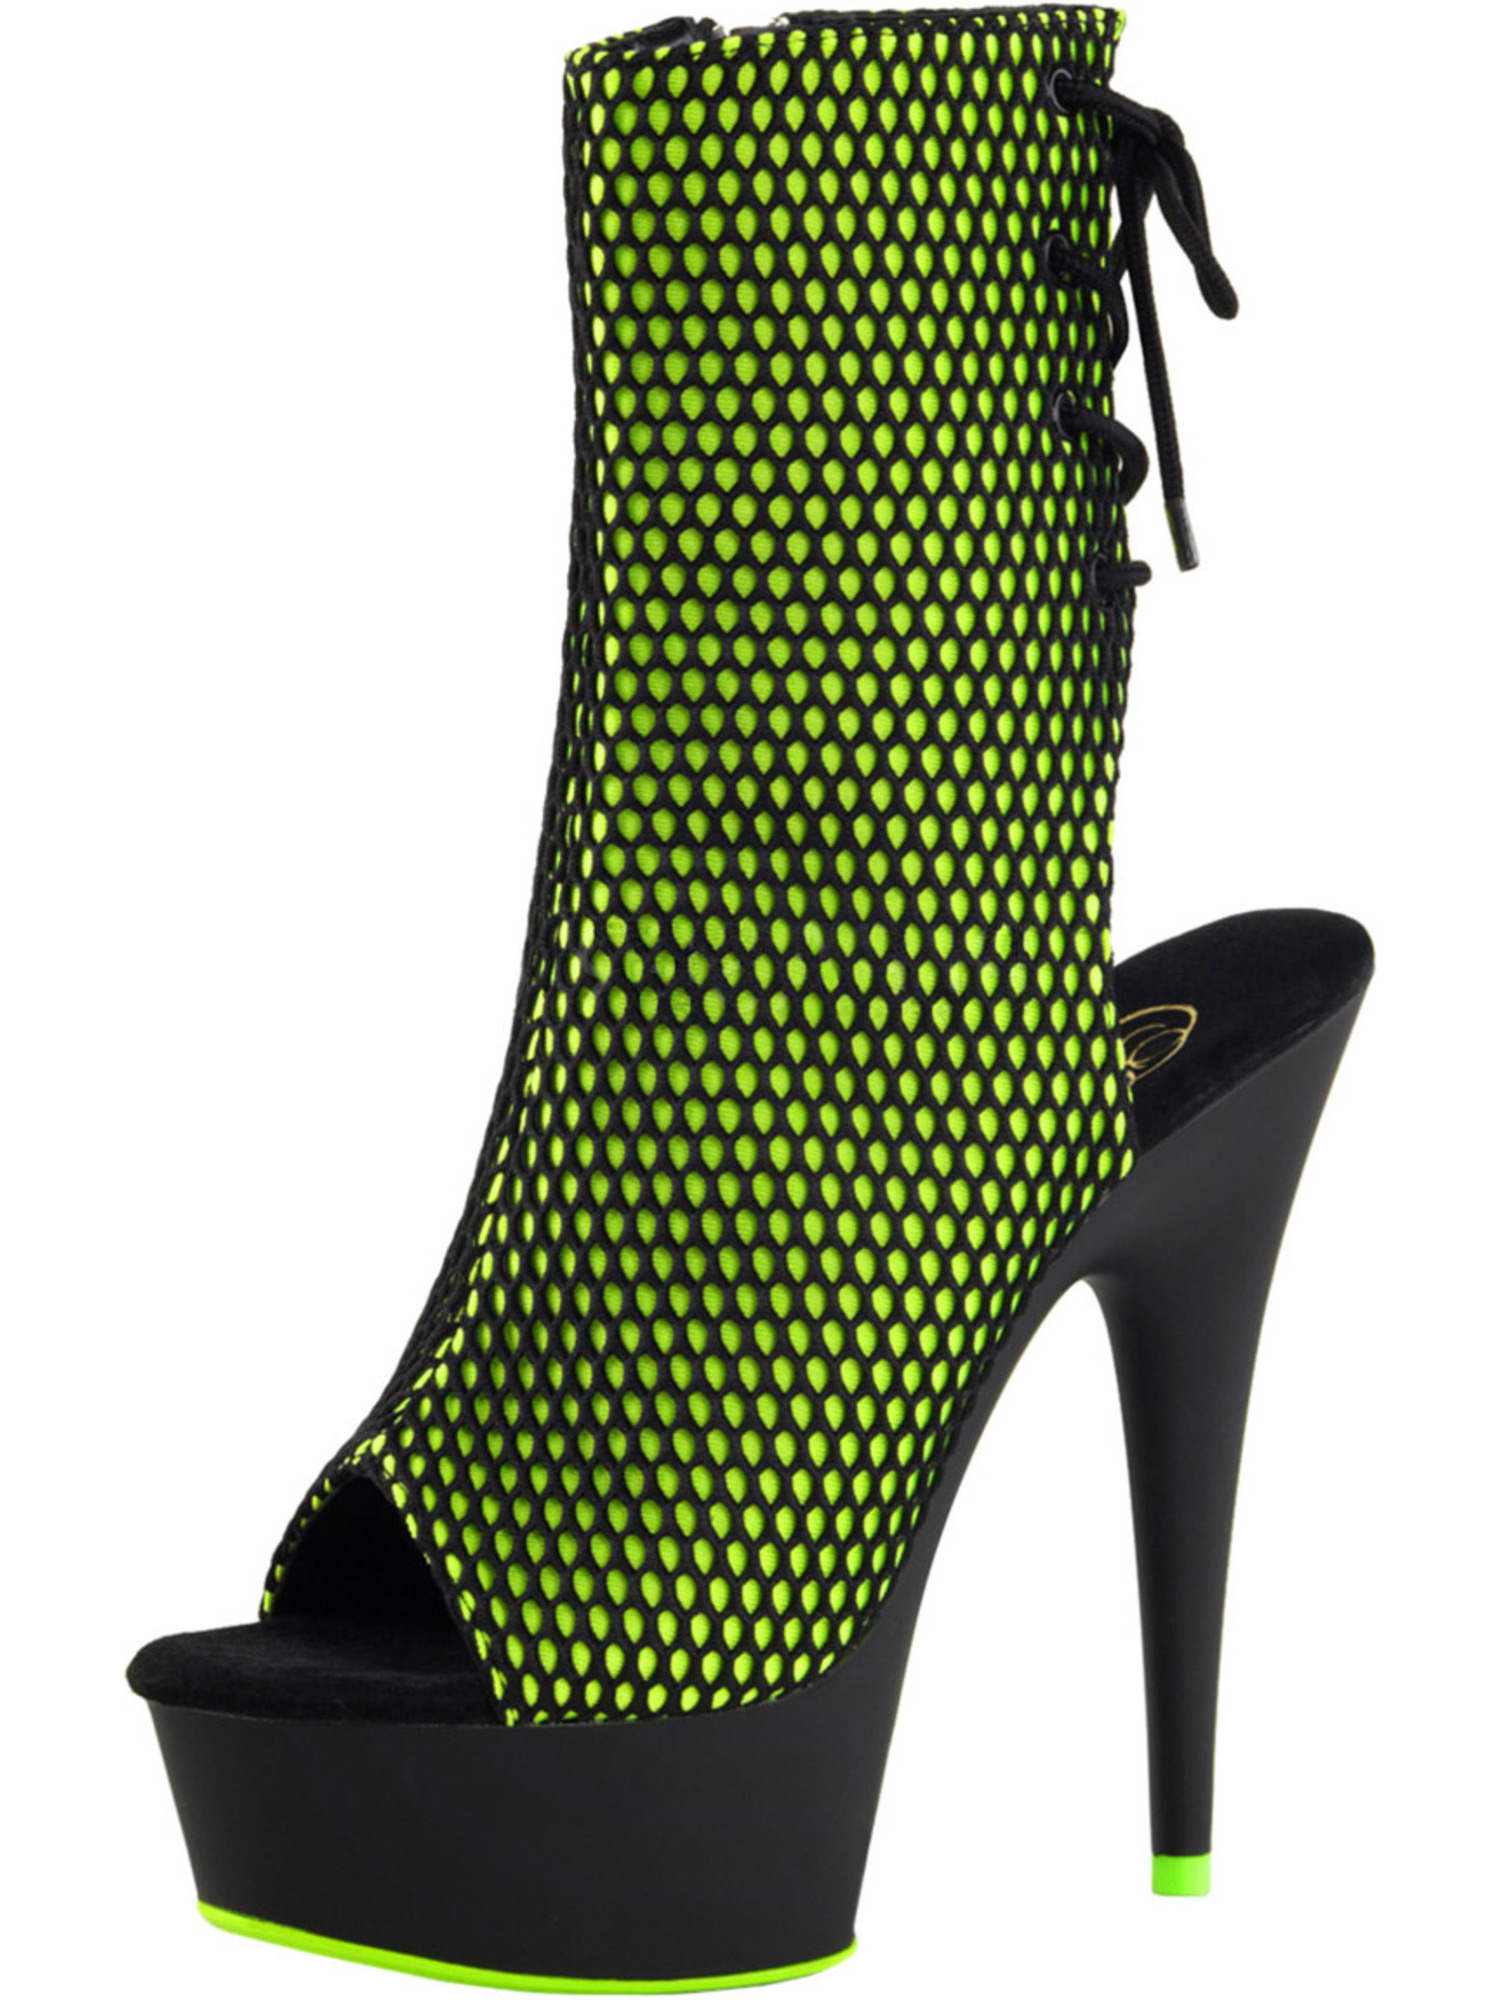 Womens Lime Green Heels Blacklight Fishnet Ankle Boots Black Booties 6 In Heels